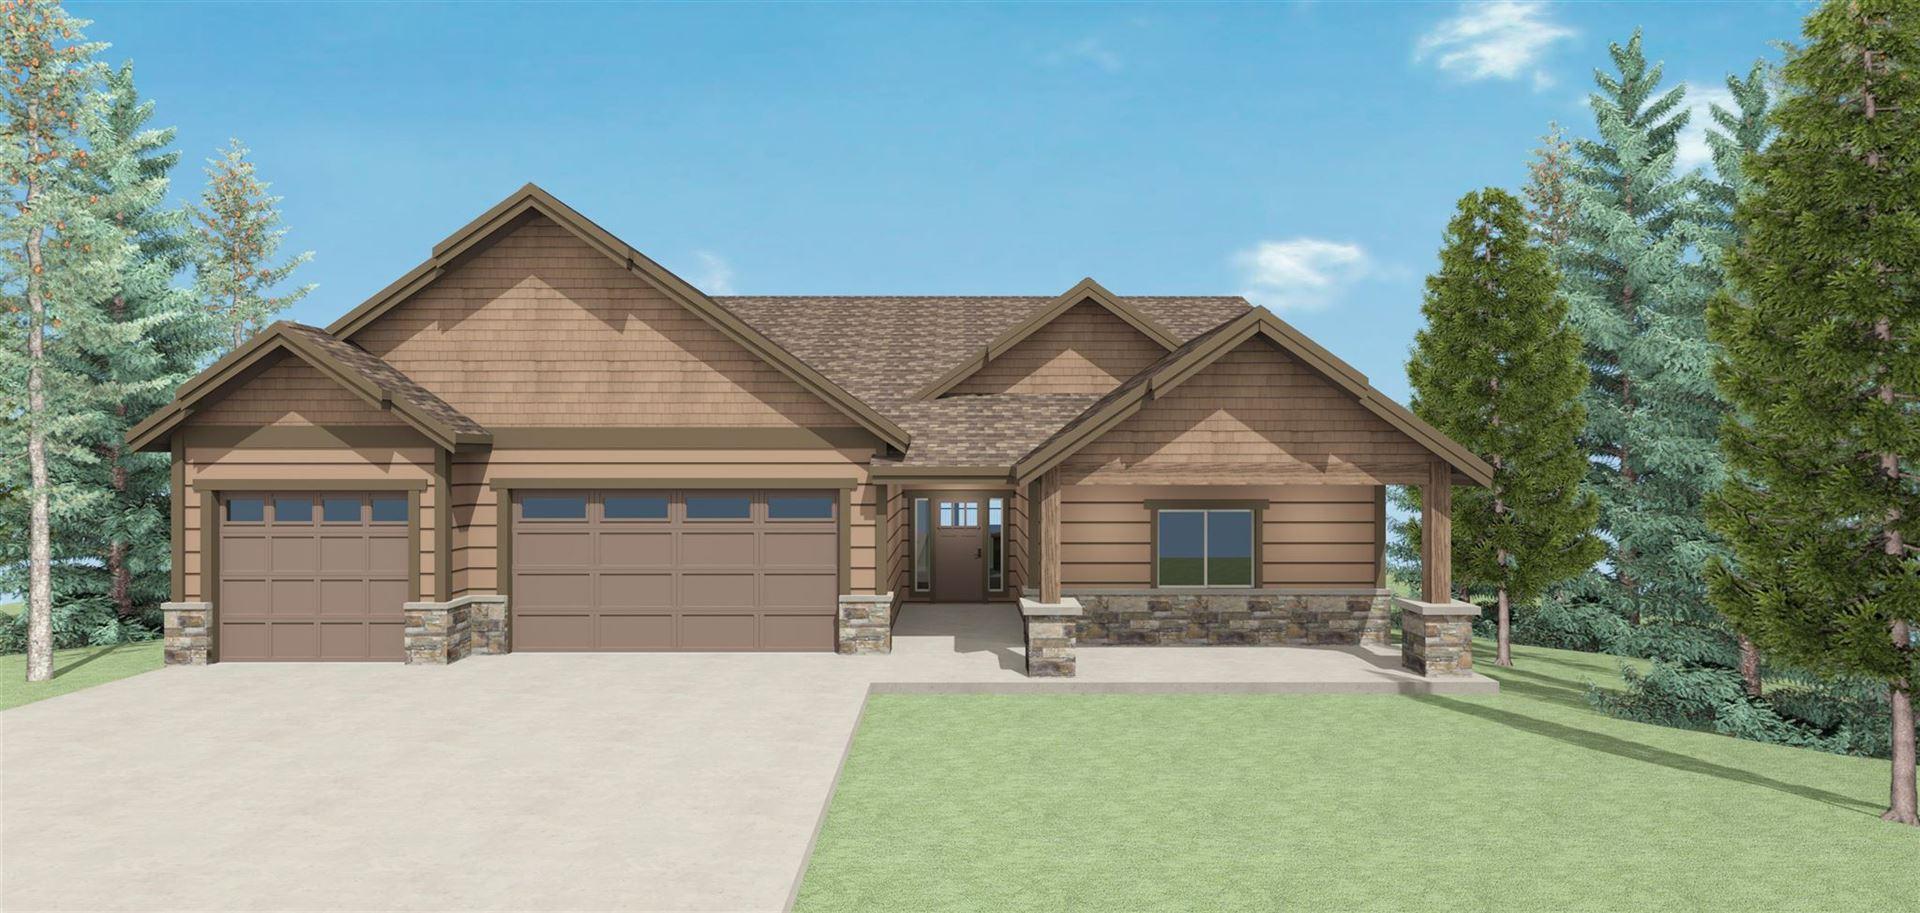 4903 E Summercrest Ct, Spokane, WA 99223-6043 - #: 202110360